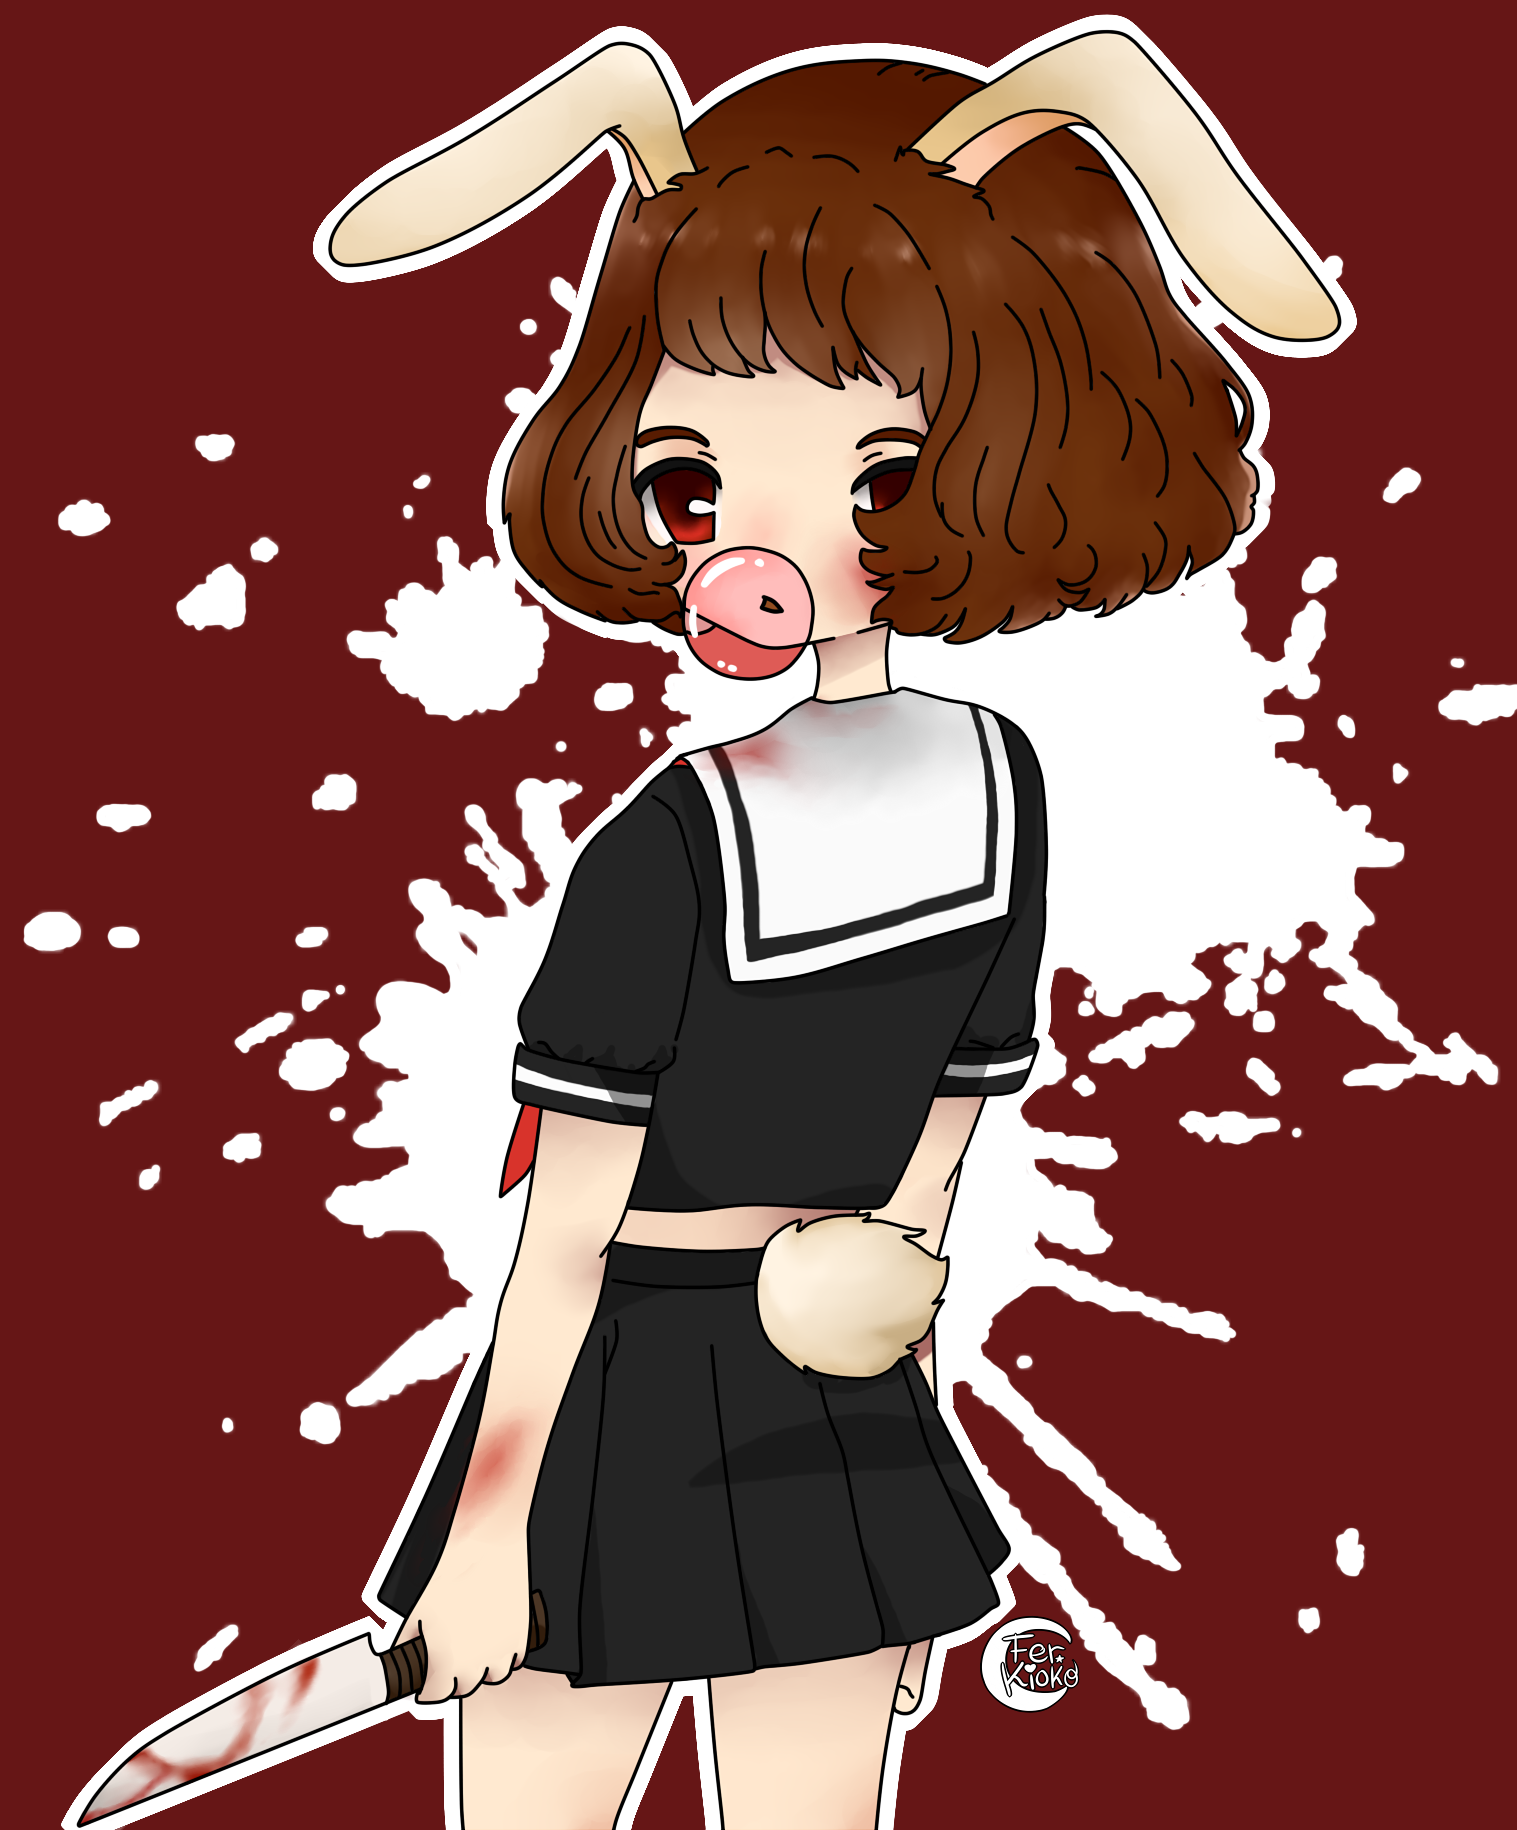 Kawaii gore by ferkioko on deviantart for Imagenes de anime gore